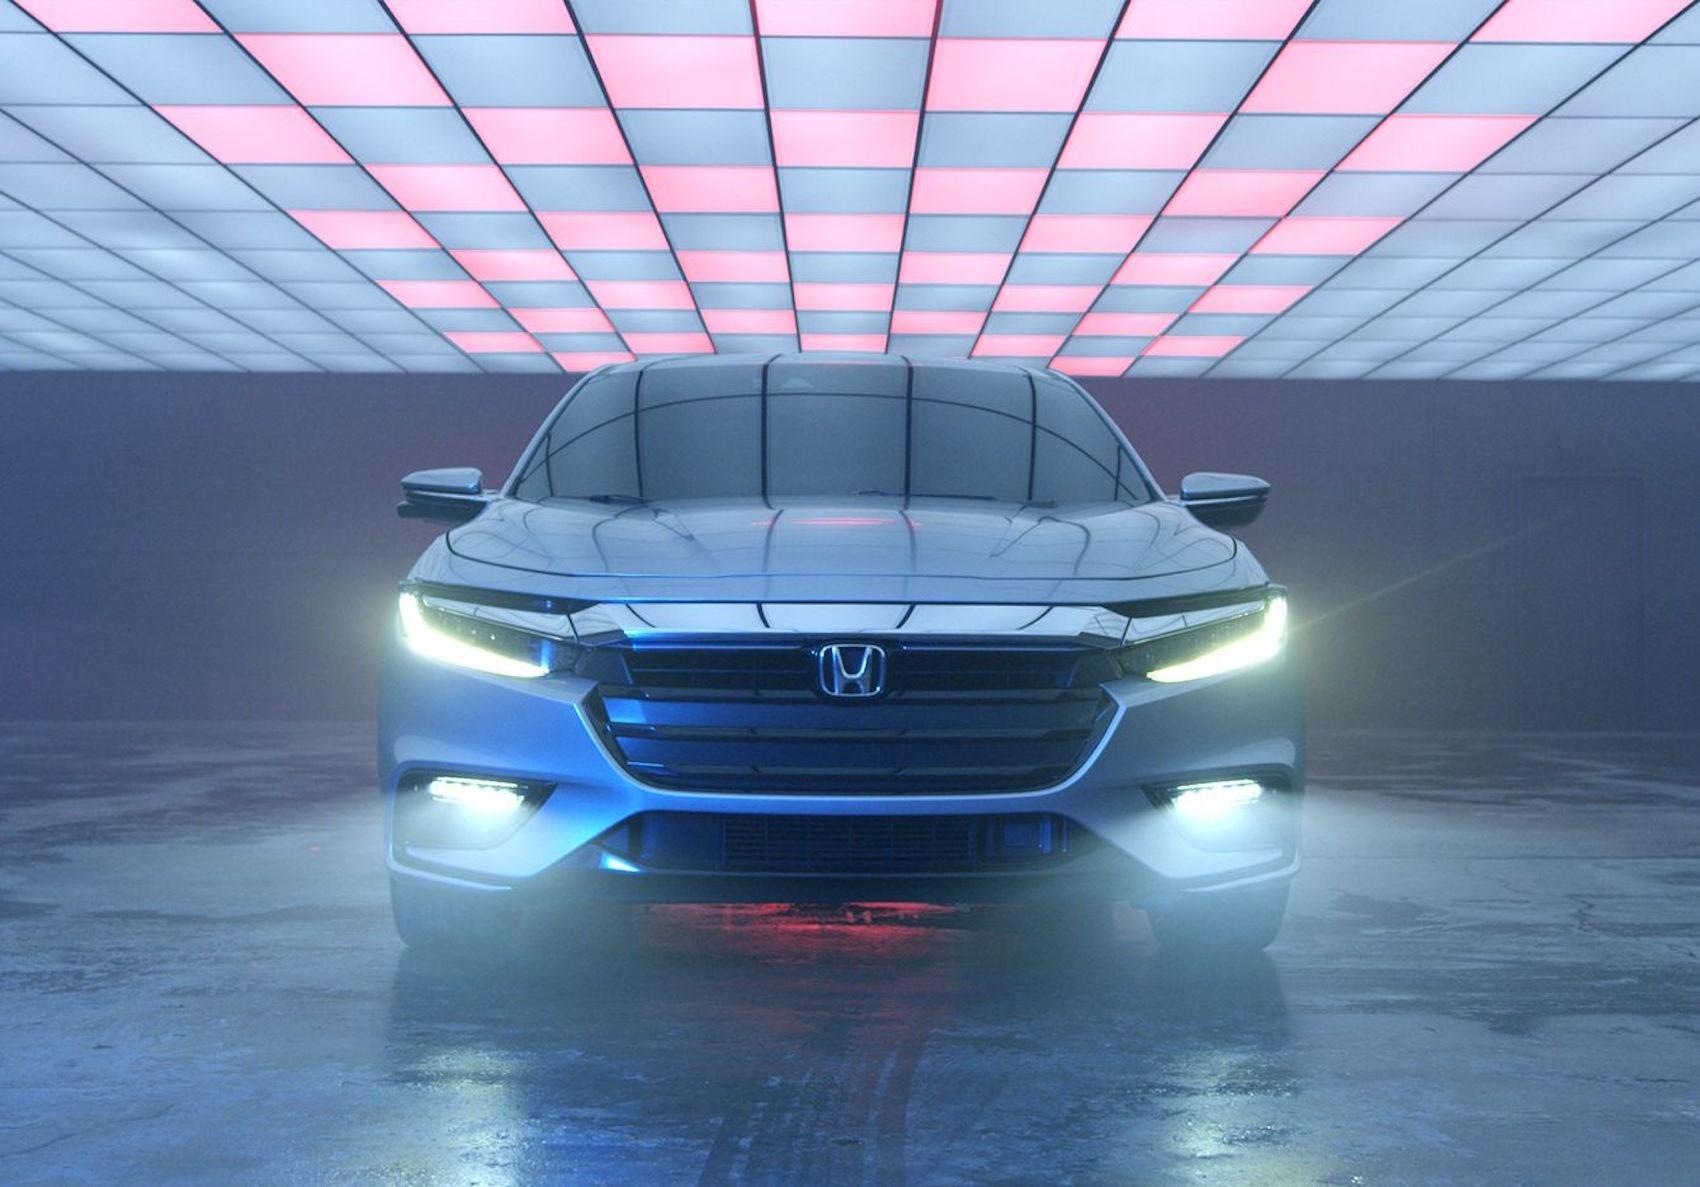 Bound Honda Insight Prototype Previews All-New 2019 Model